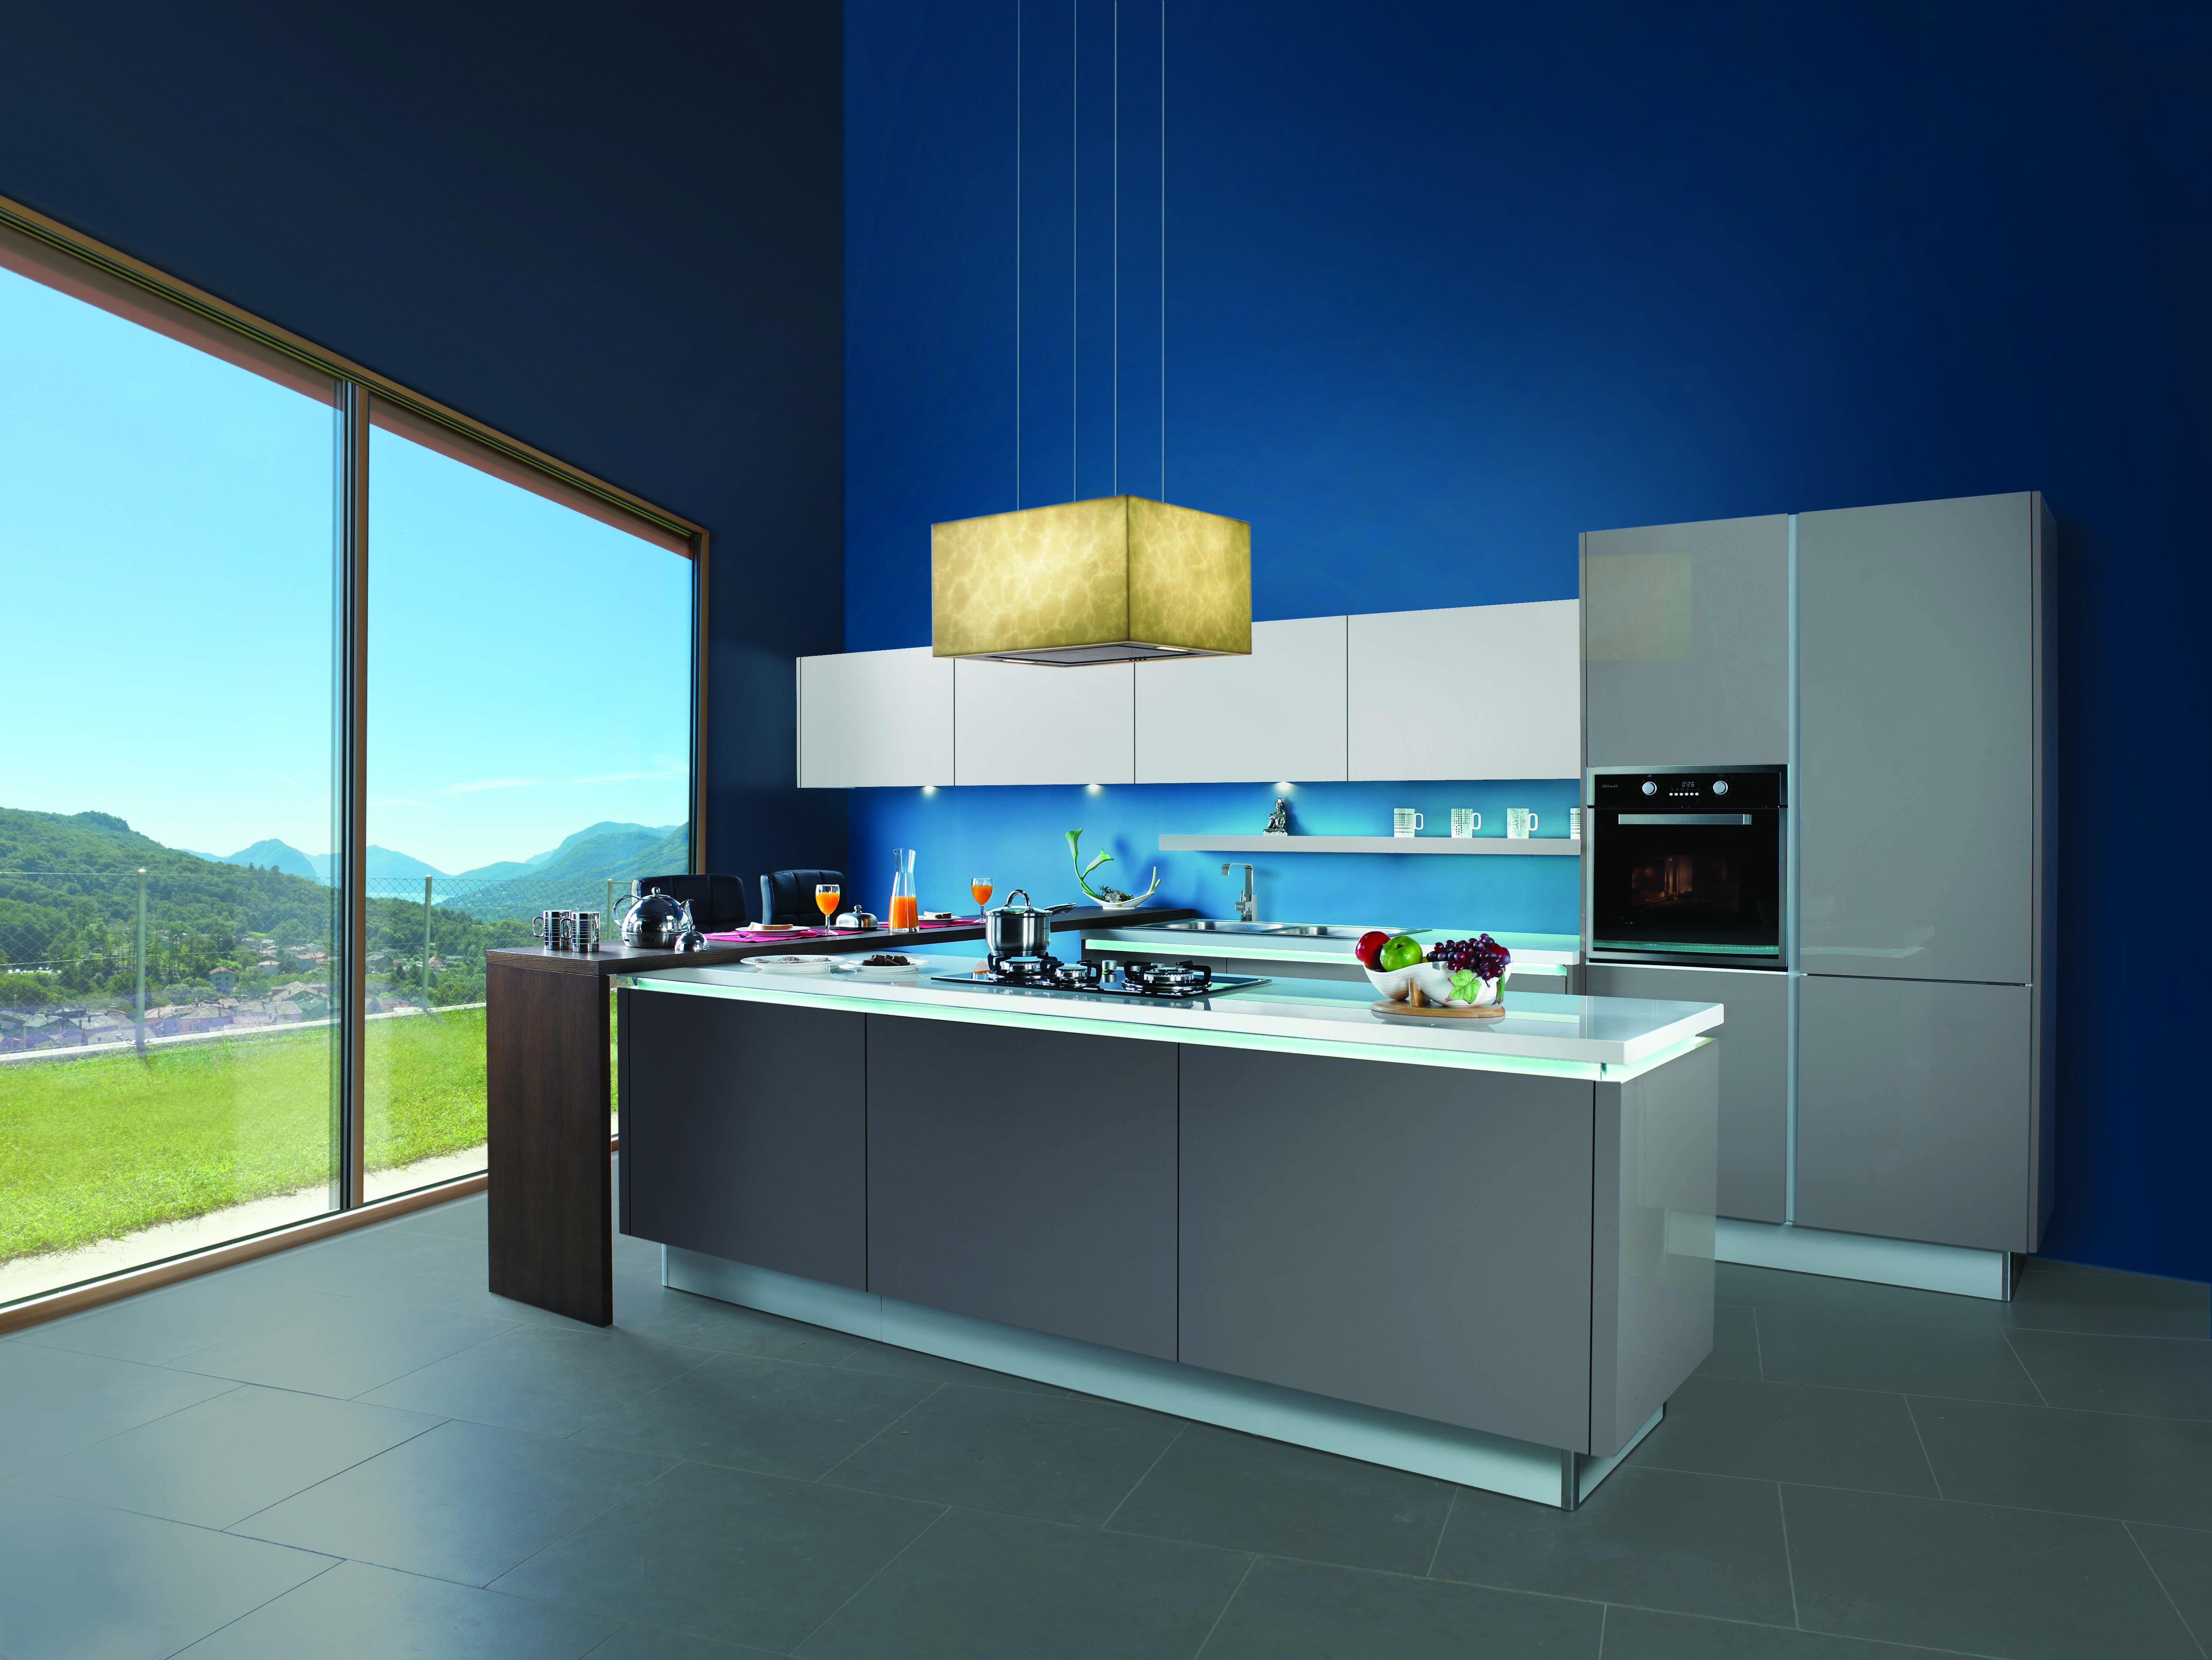 SLEEK Modular Kitchens http://www.sleekkitchens.com/modular-kitchen ...